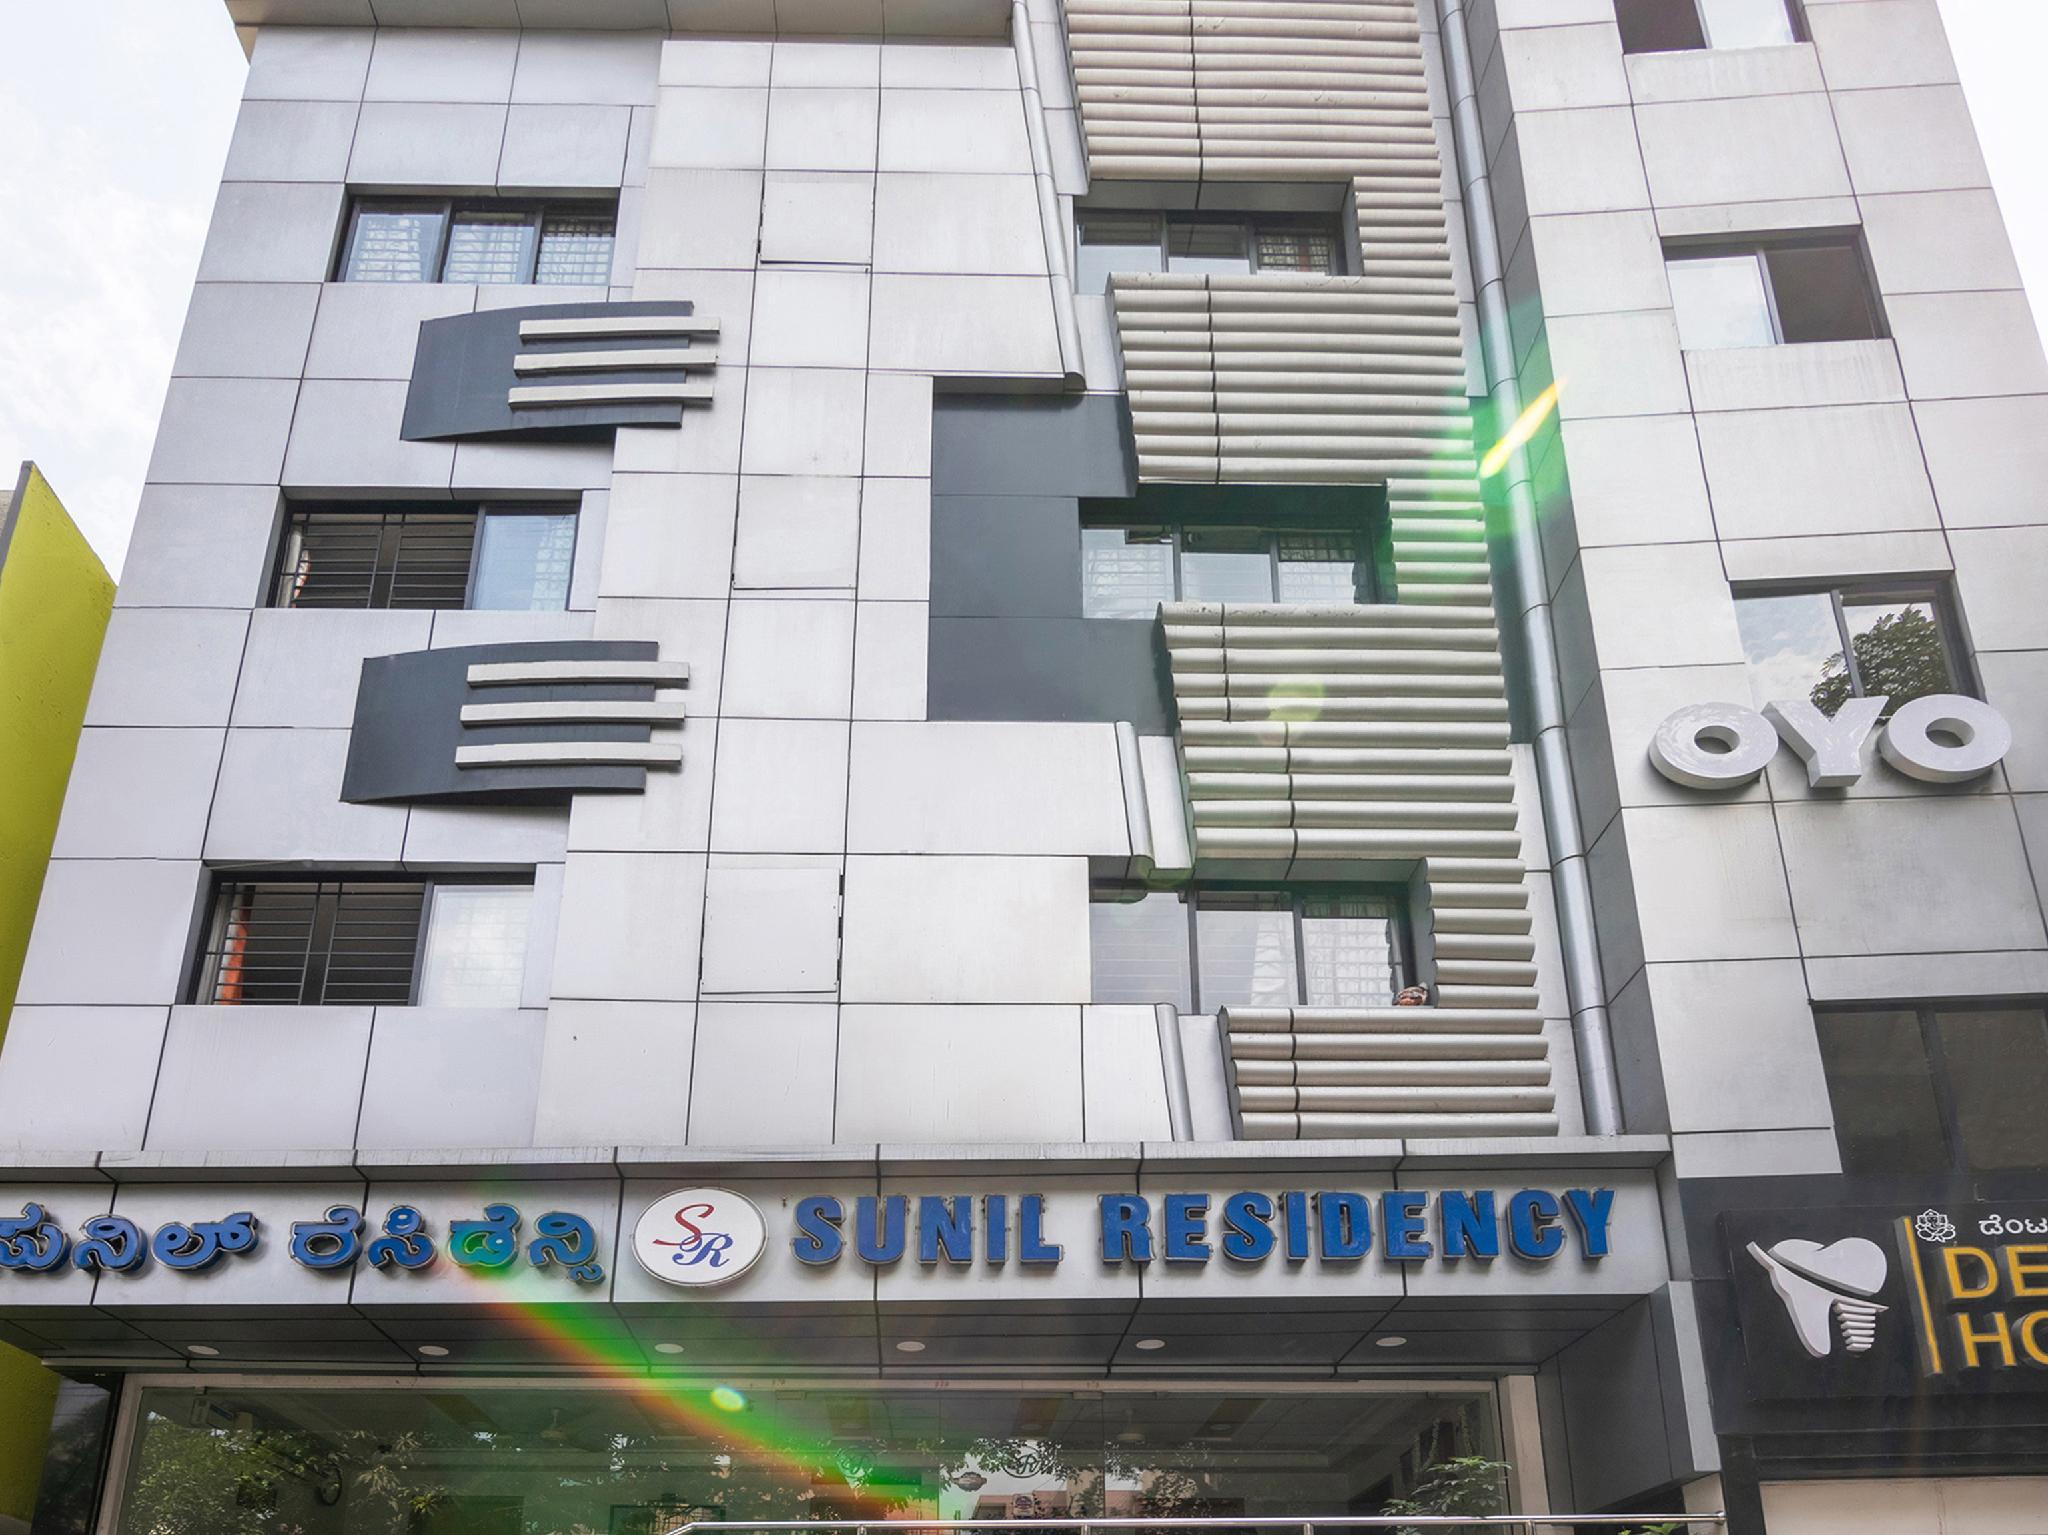 OYO 765 Hotel Sunil Residency